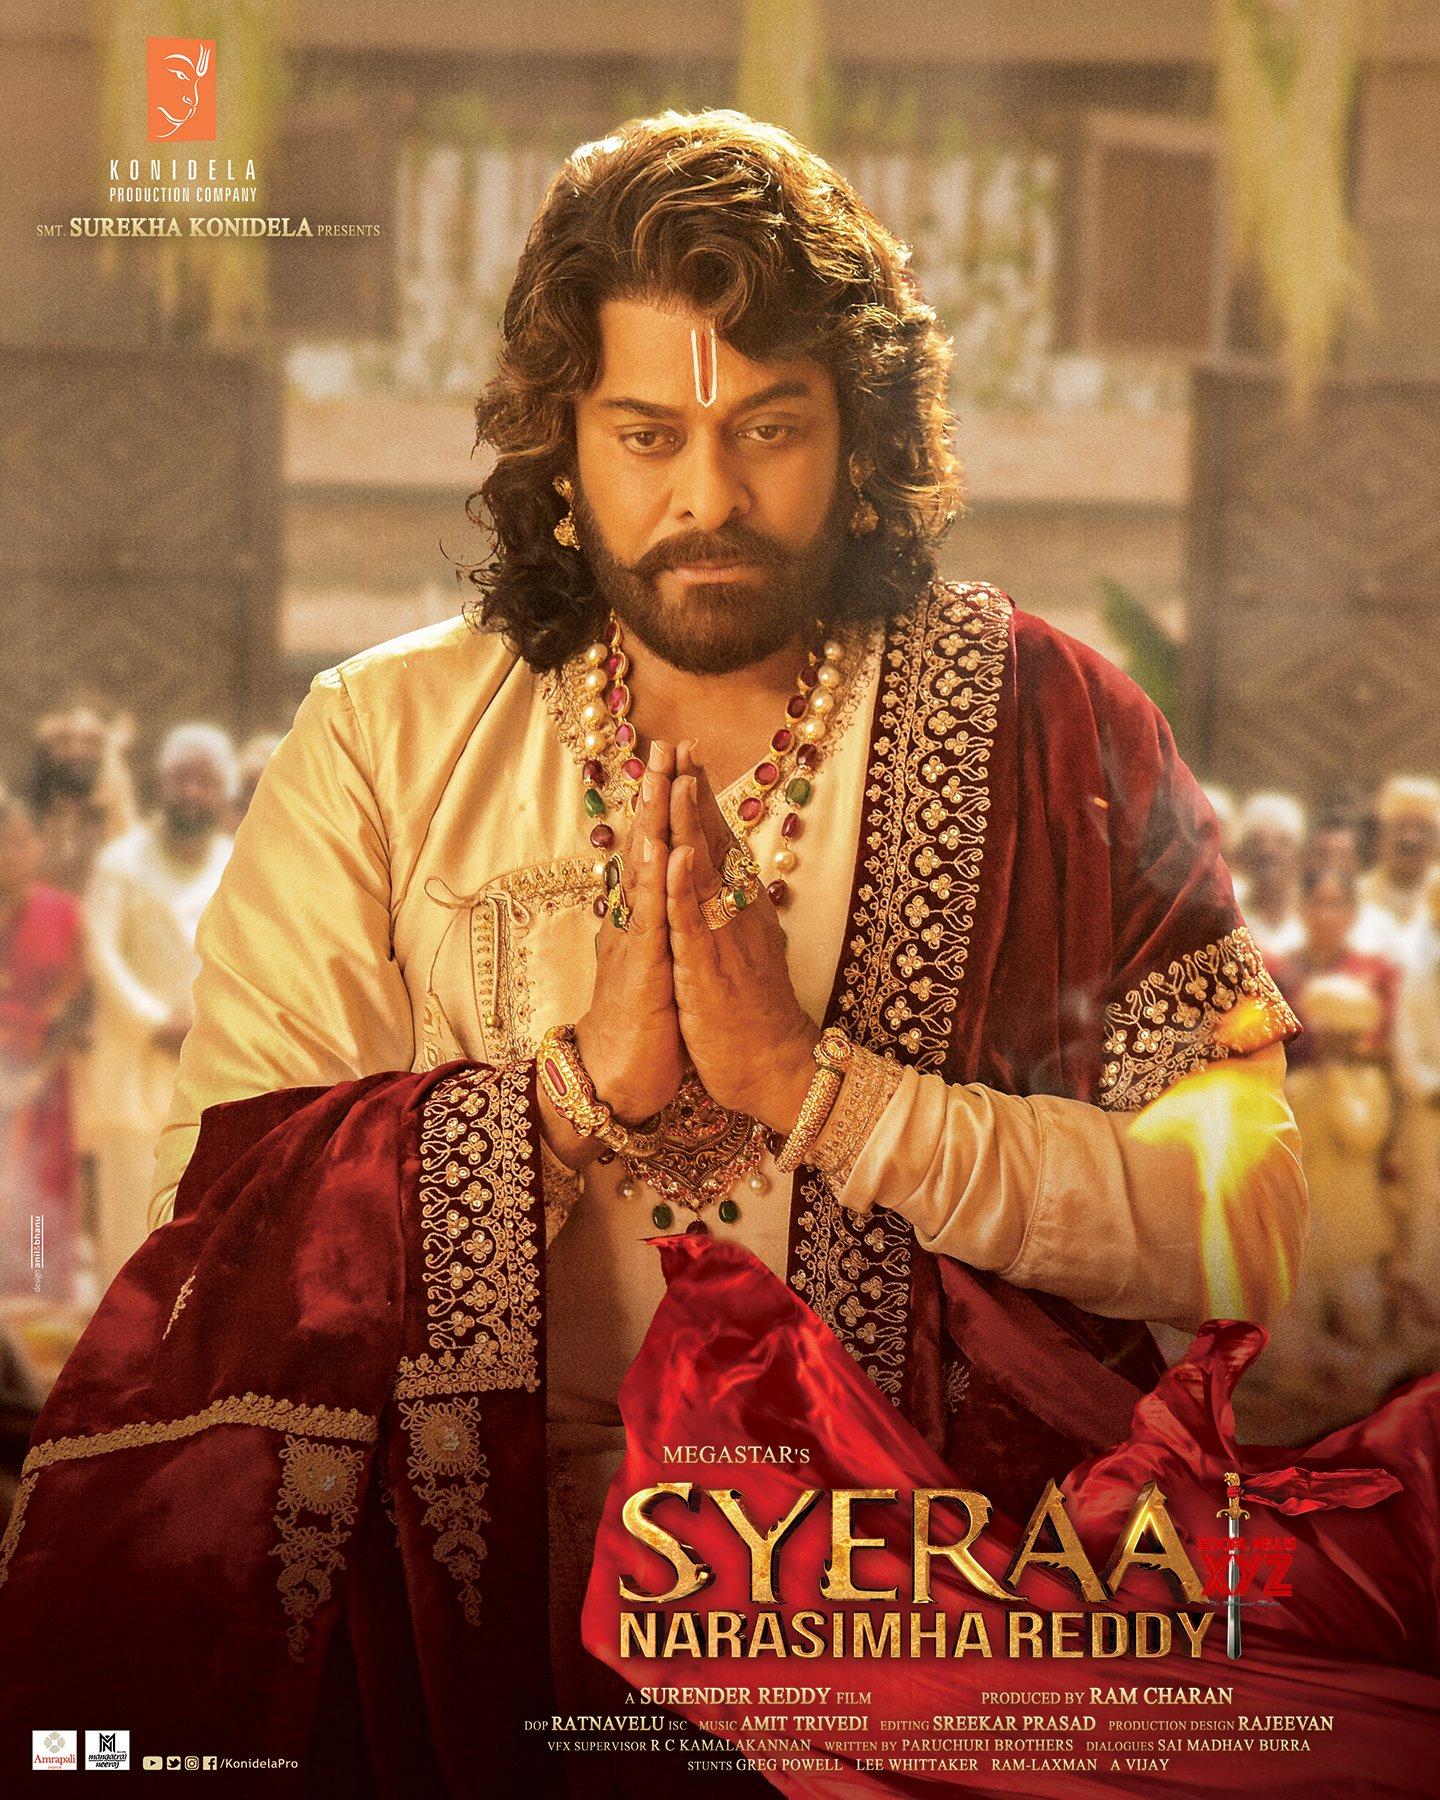 Megastar Chiranjeevi's SyeRaa New HD Posters